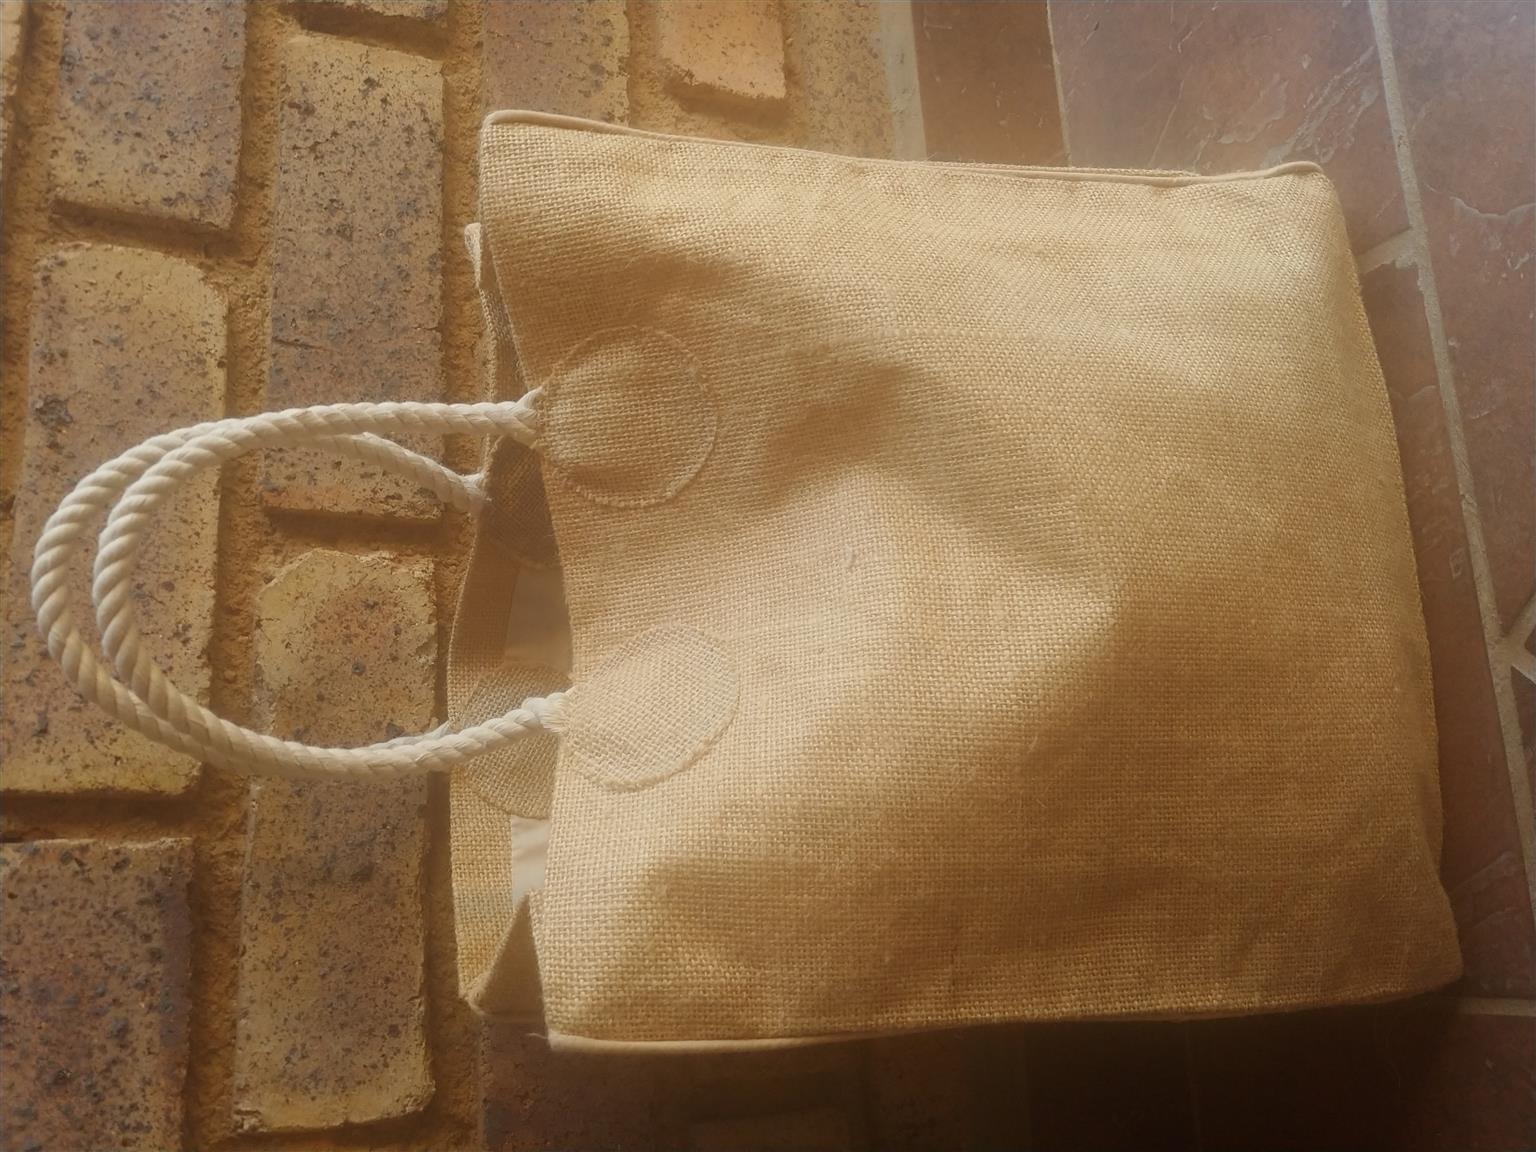 Hessian bag